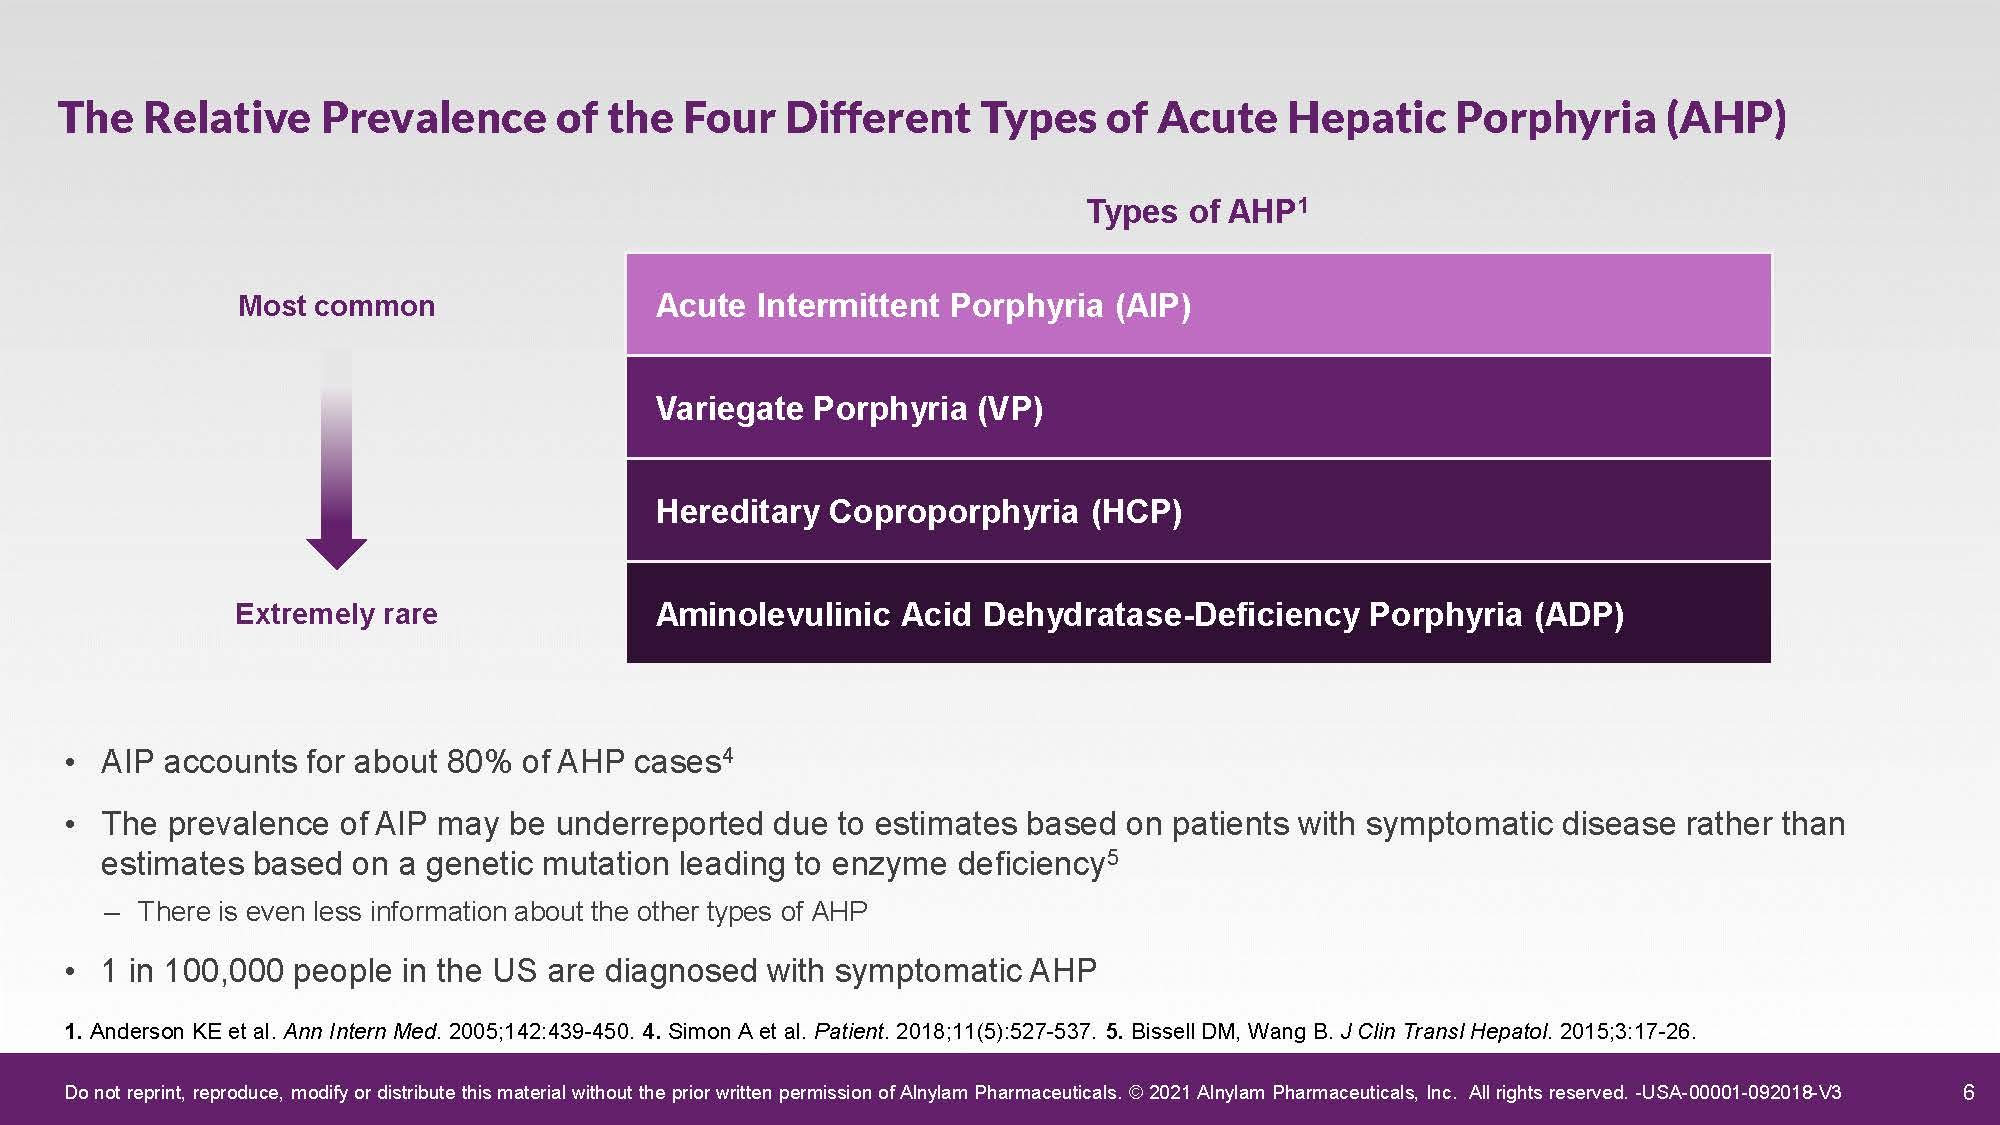 Signs & Symptoms of Acute Hepatic Porphyria | Porphyria